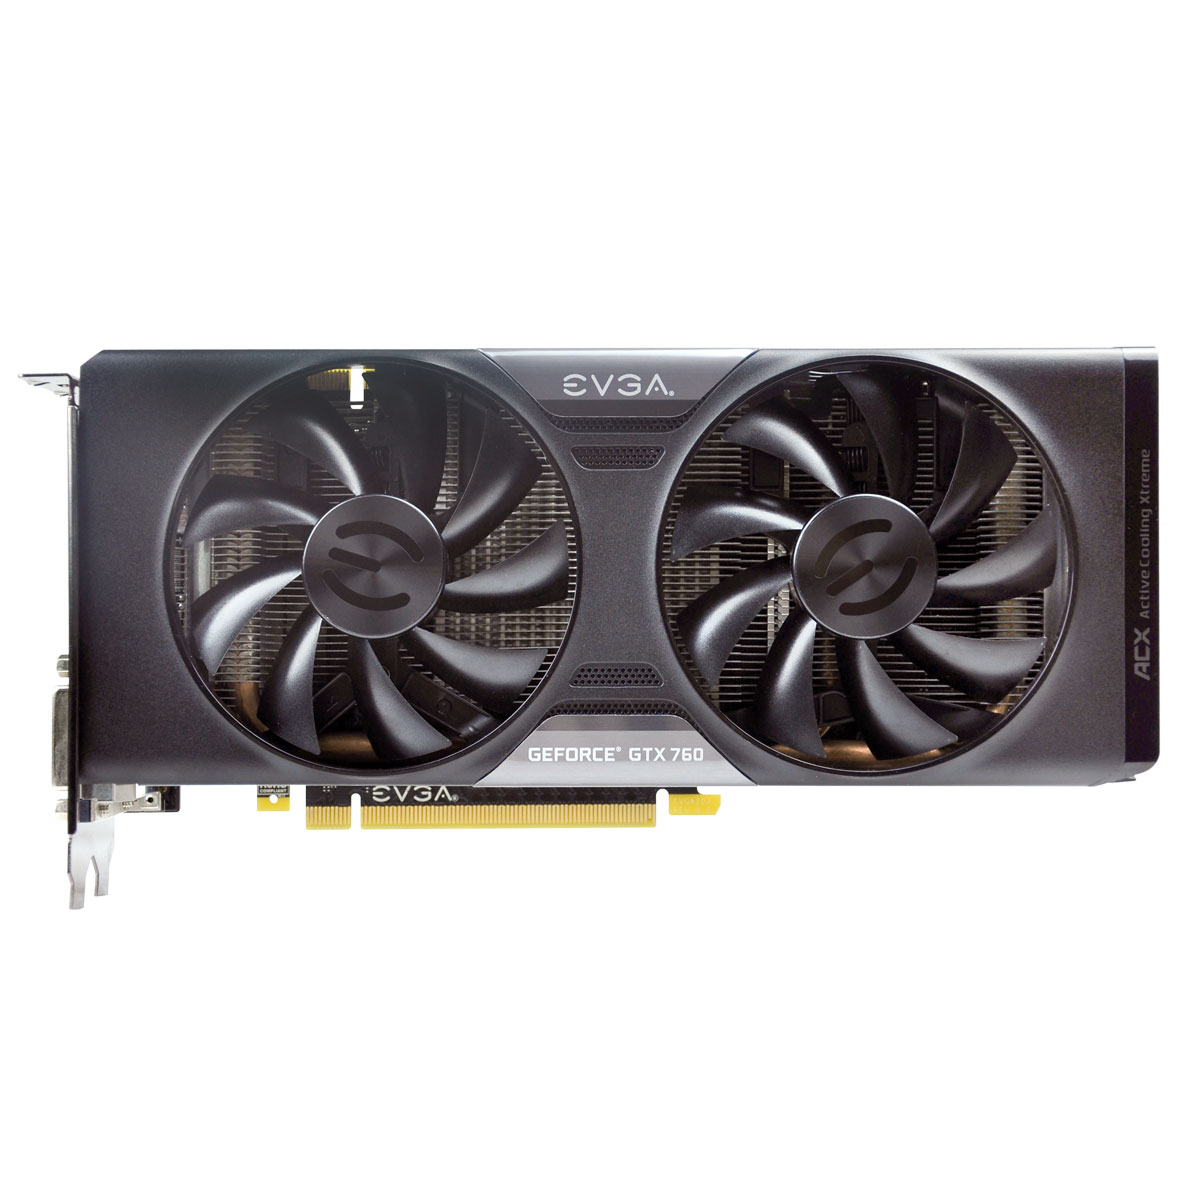 Placa de Video GeForce GTX760 4GB DDR5 256Bits Superclocked 04G-P4-2768-KR - EVGA